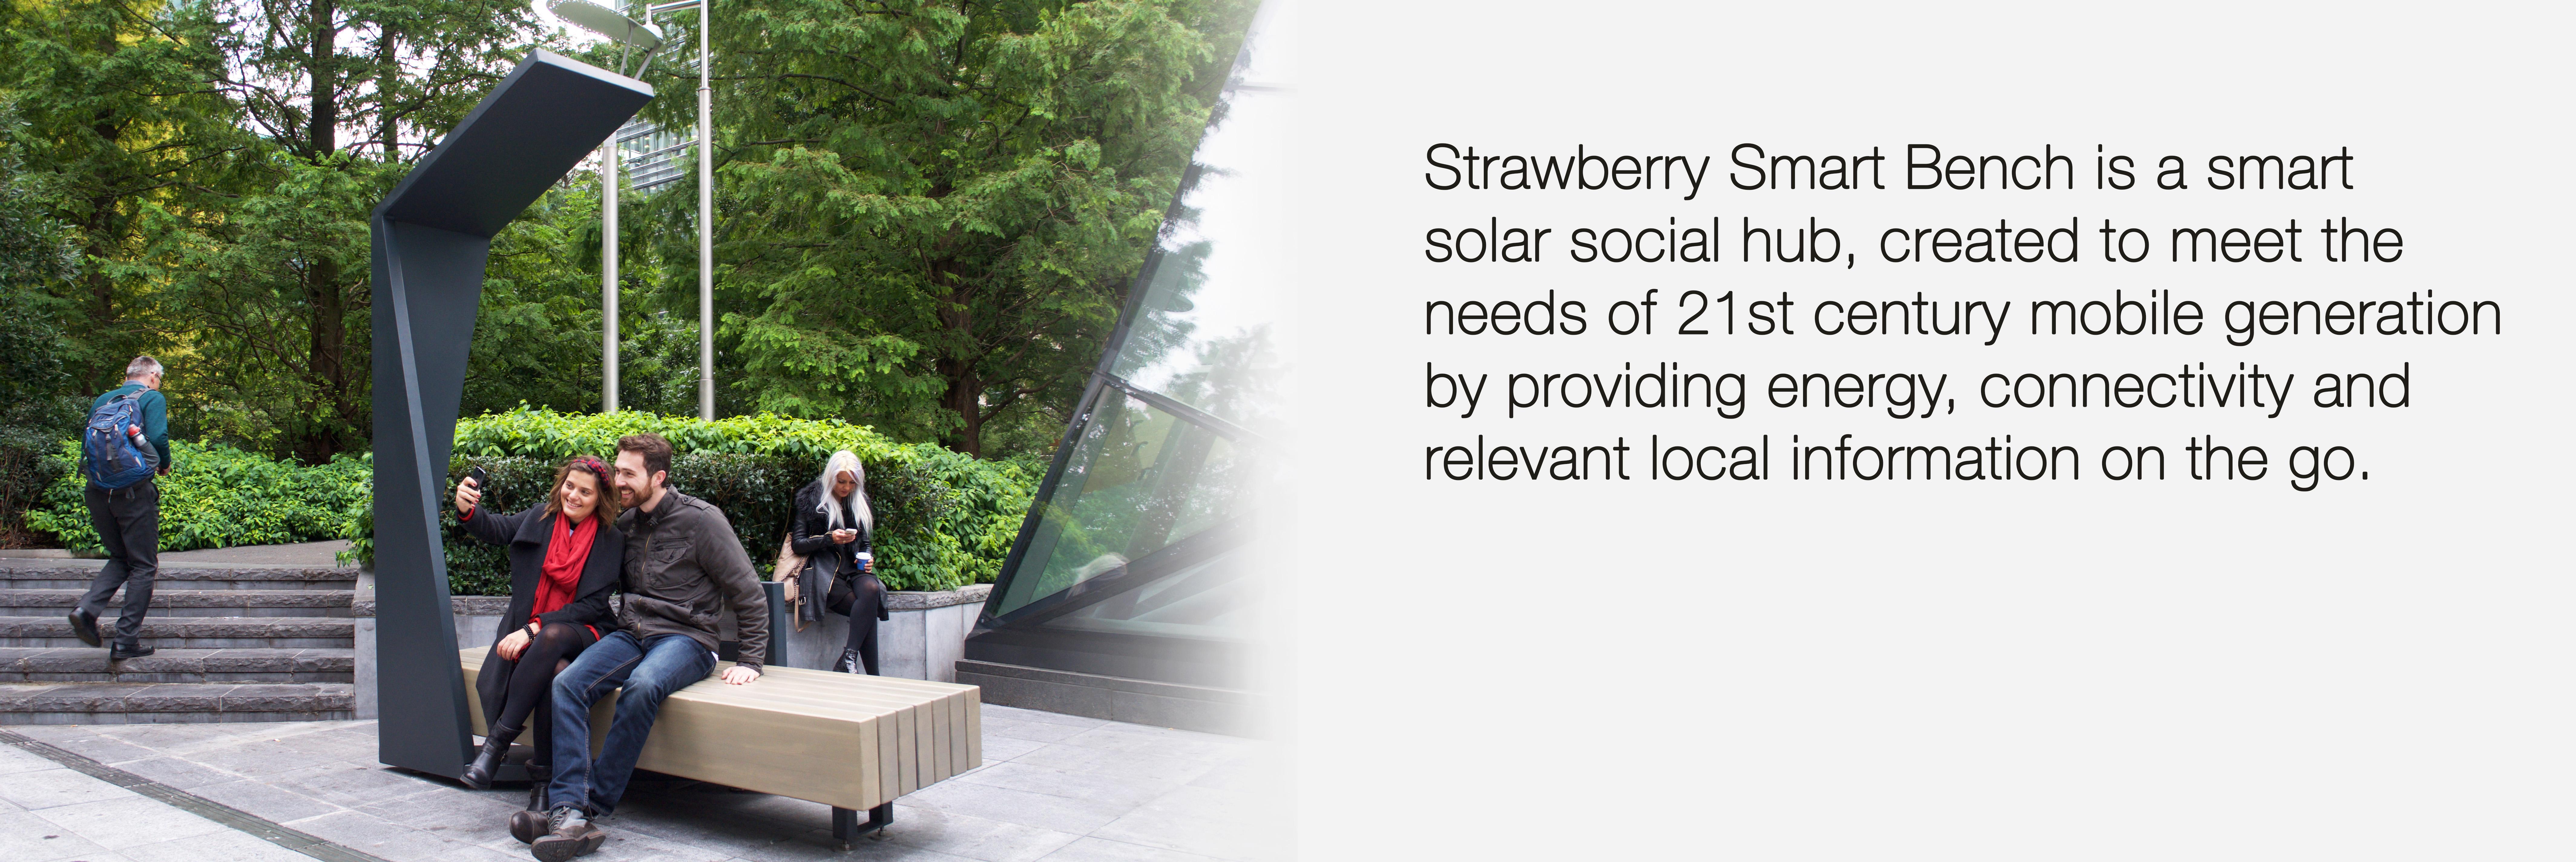 Strawberry Smart Bench blog eng